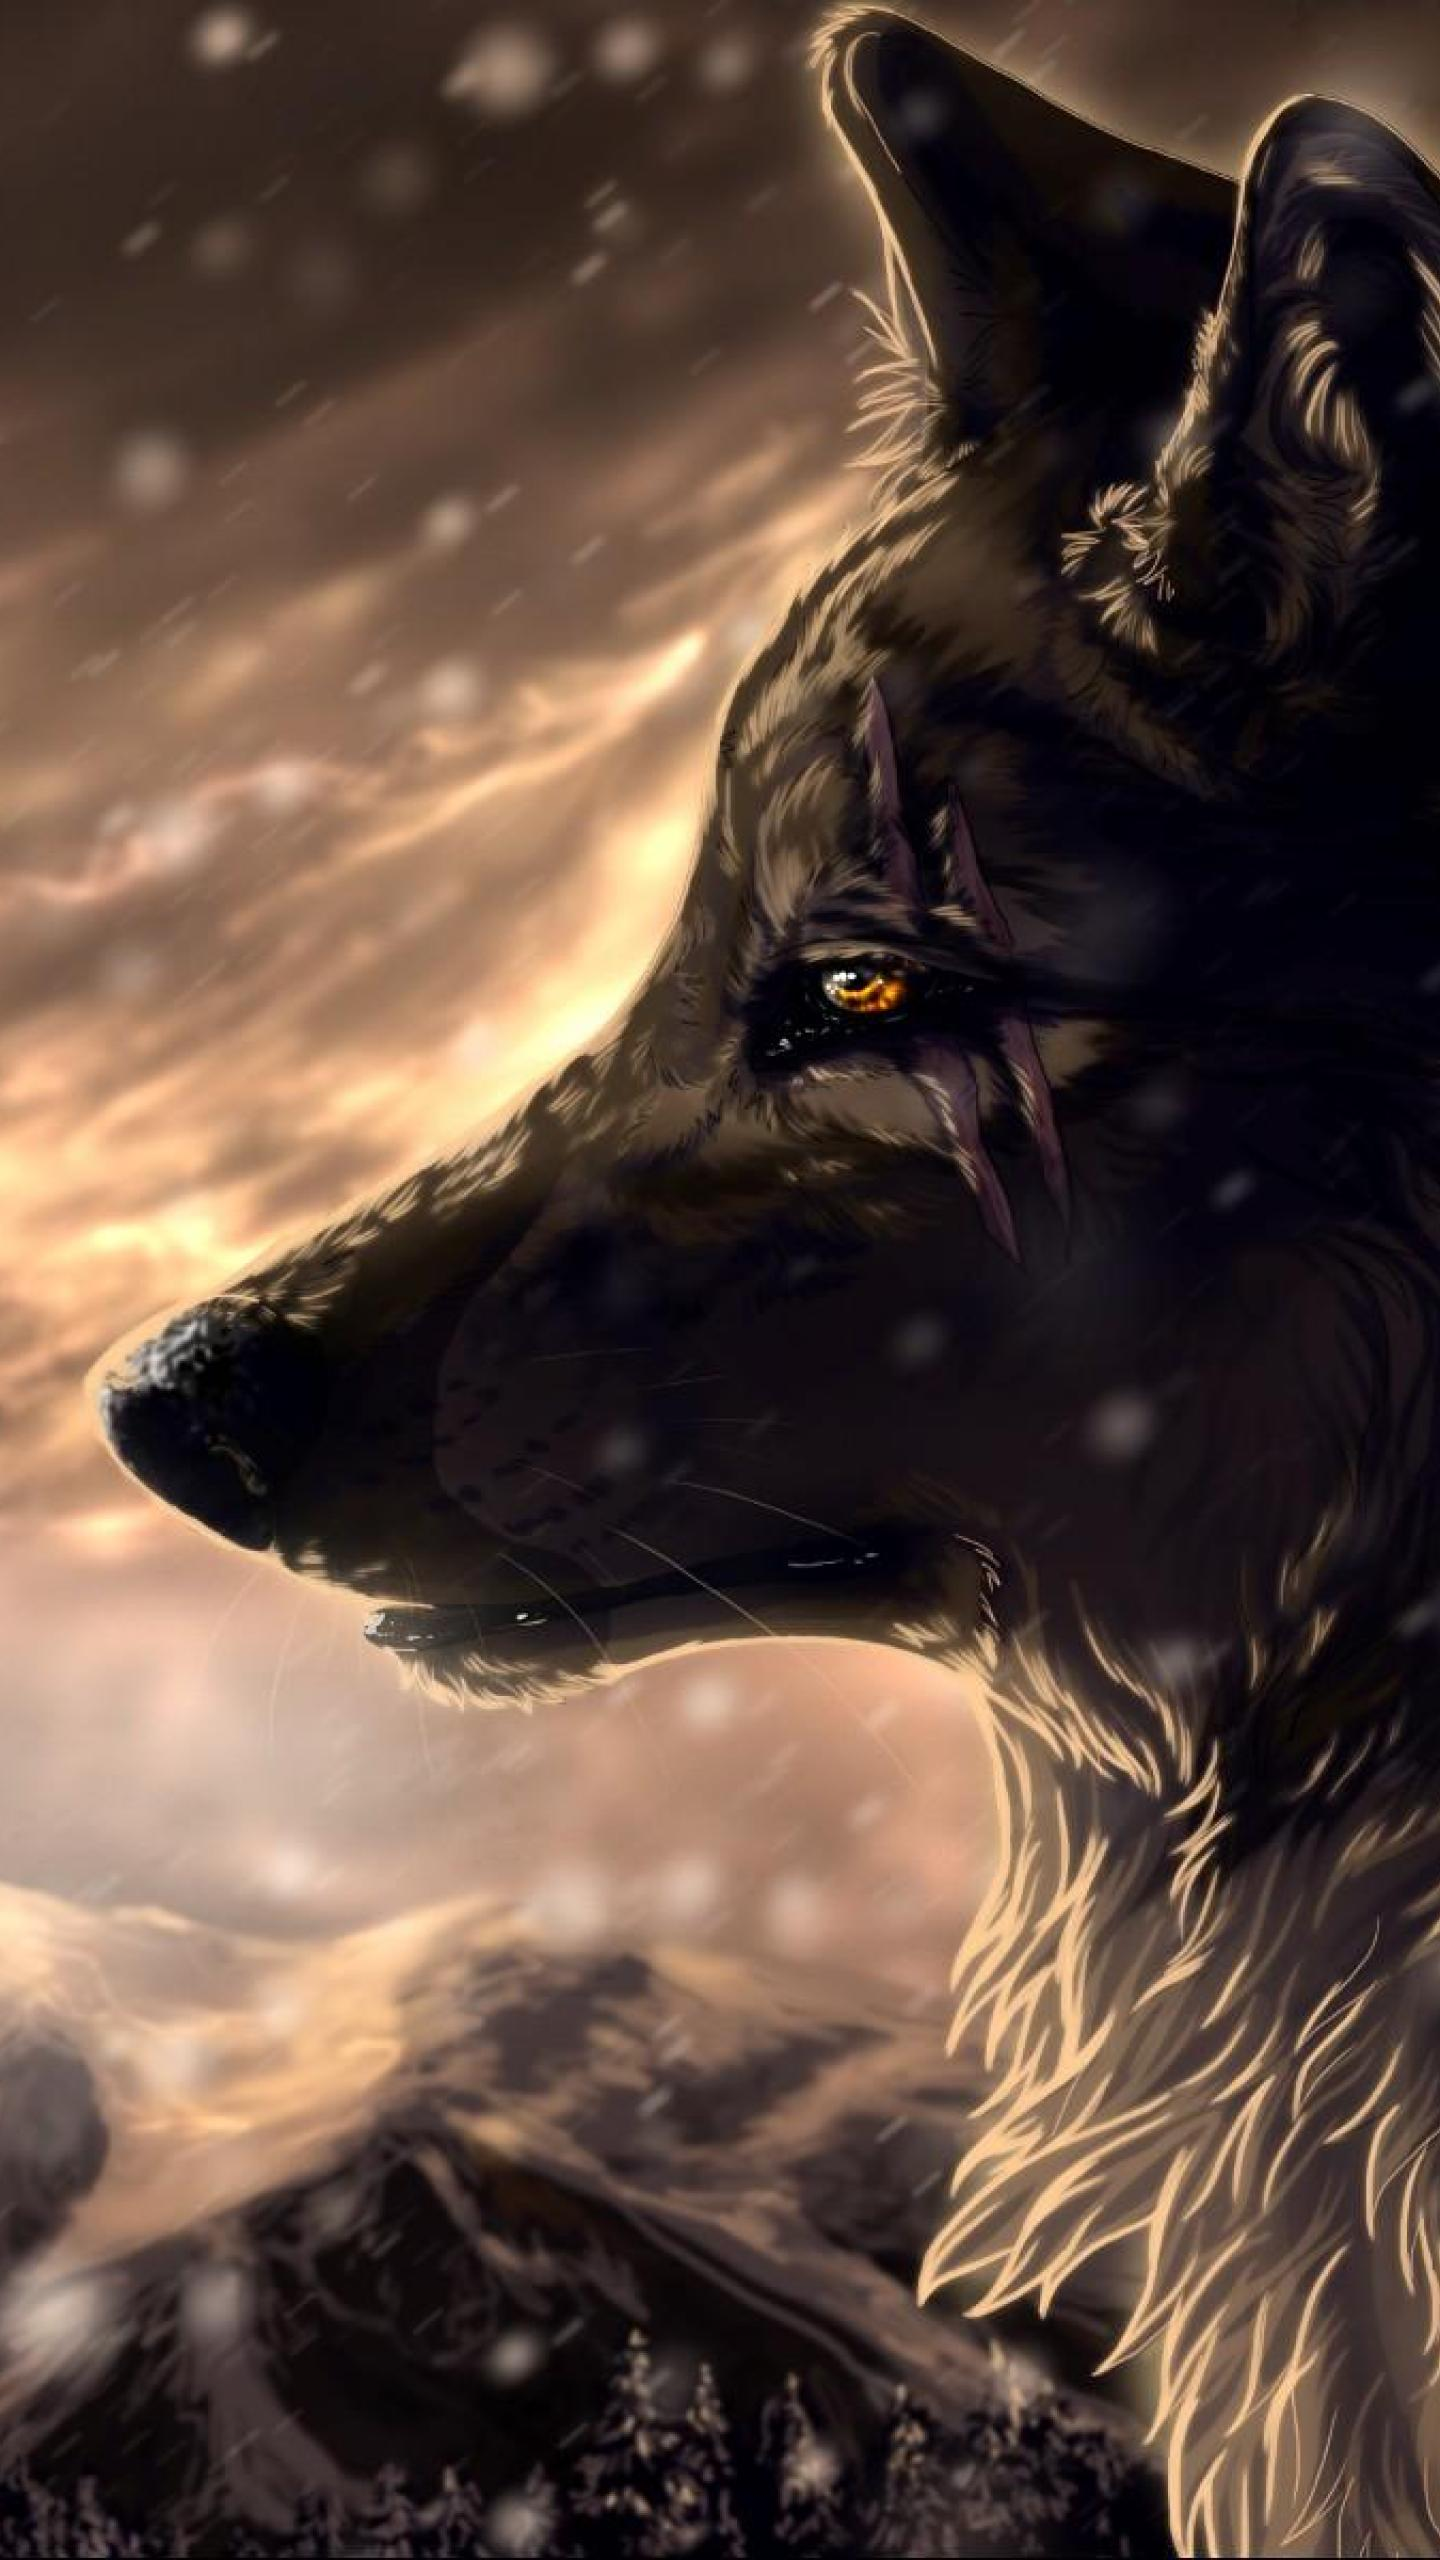 Anime wolf wallpaper wallpapersafari - Anime wolf wallpaper ...